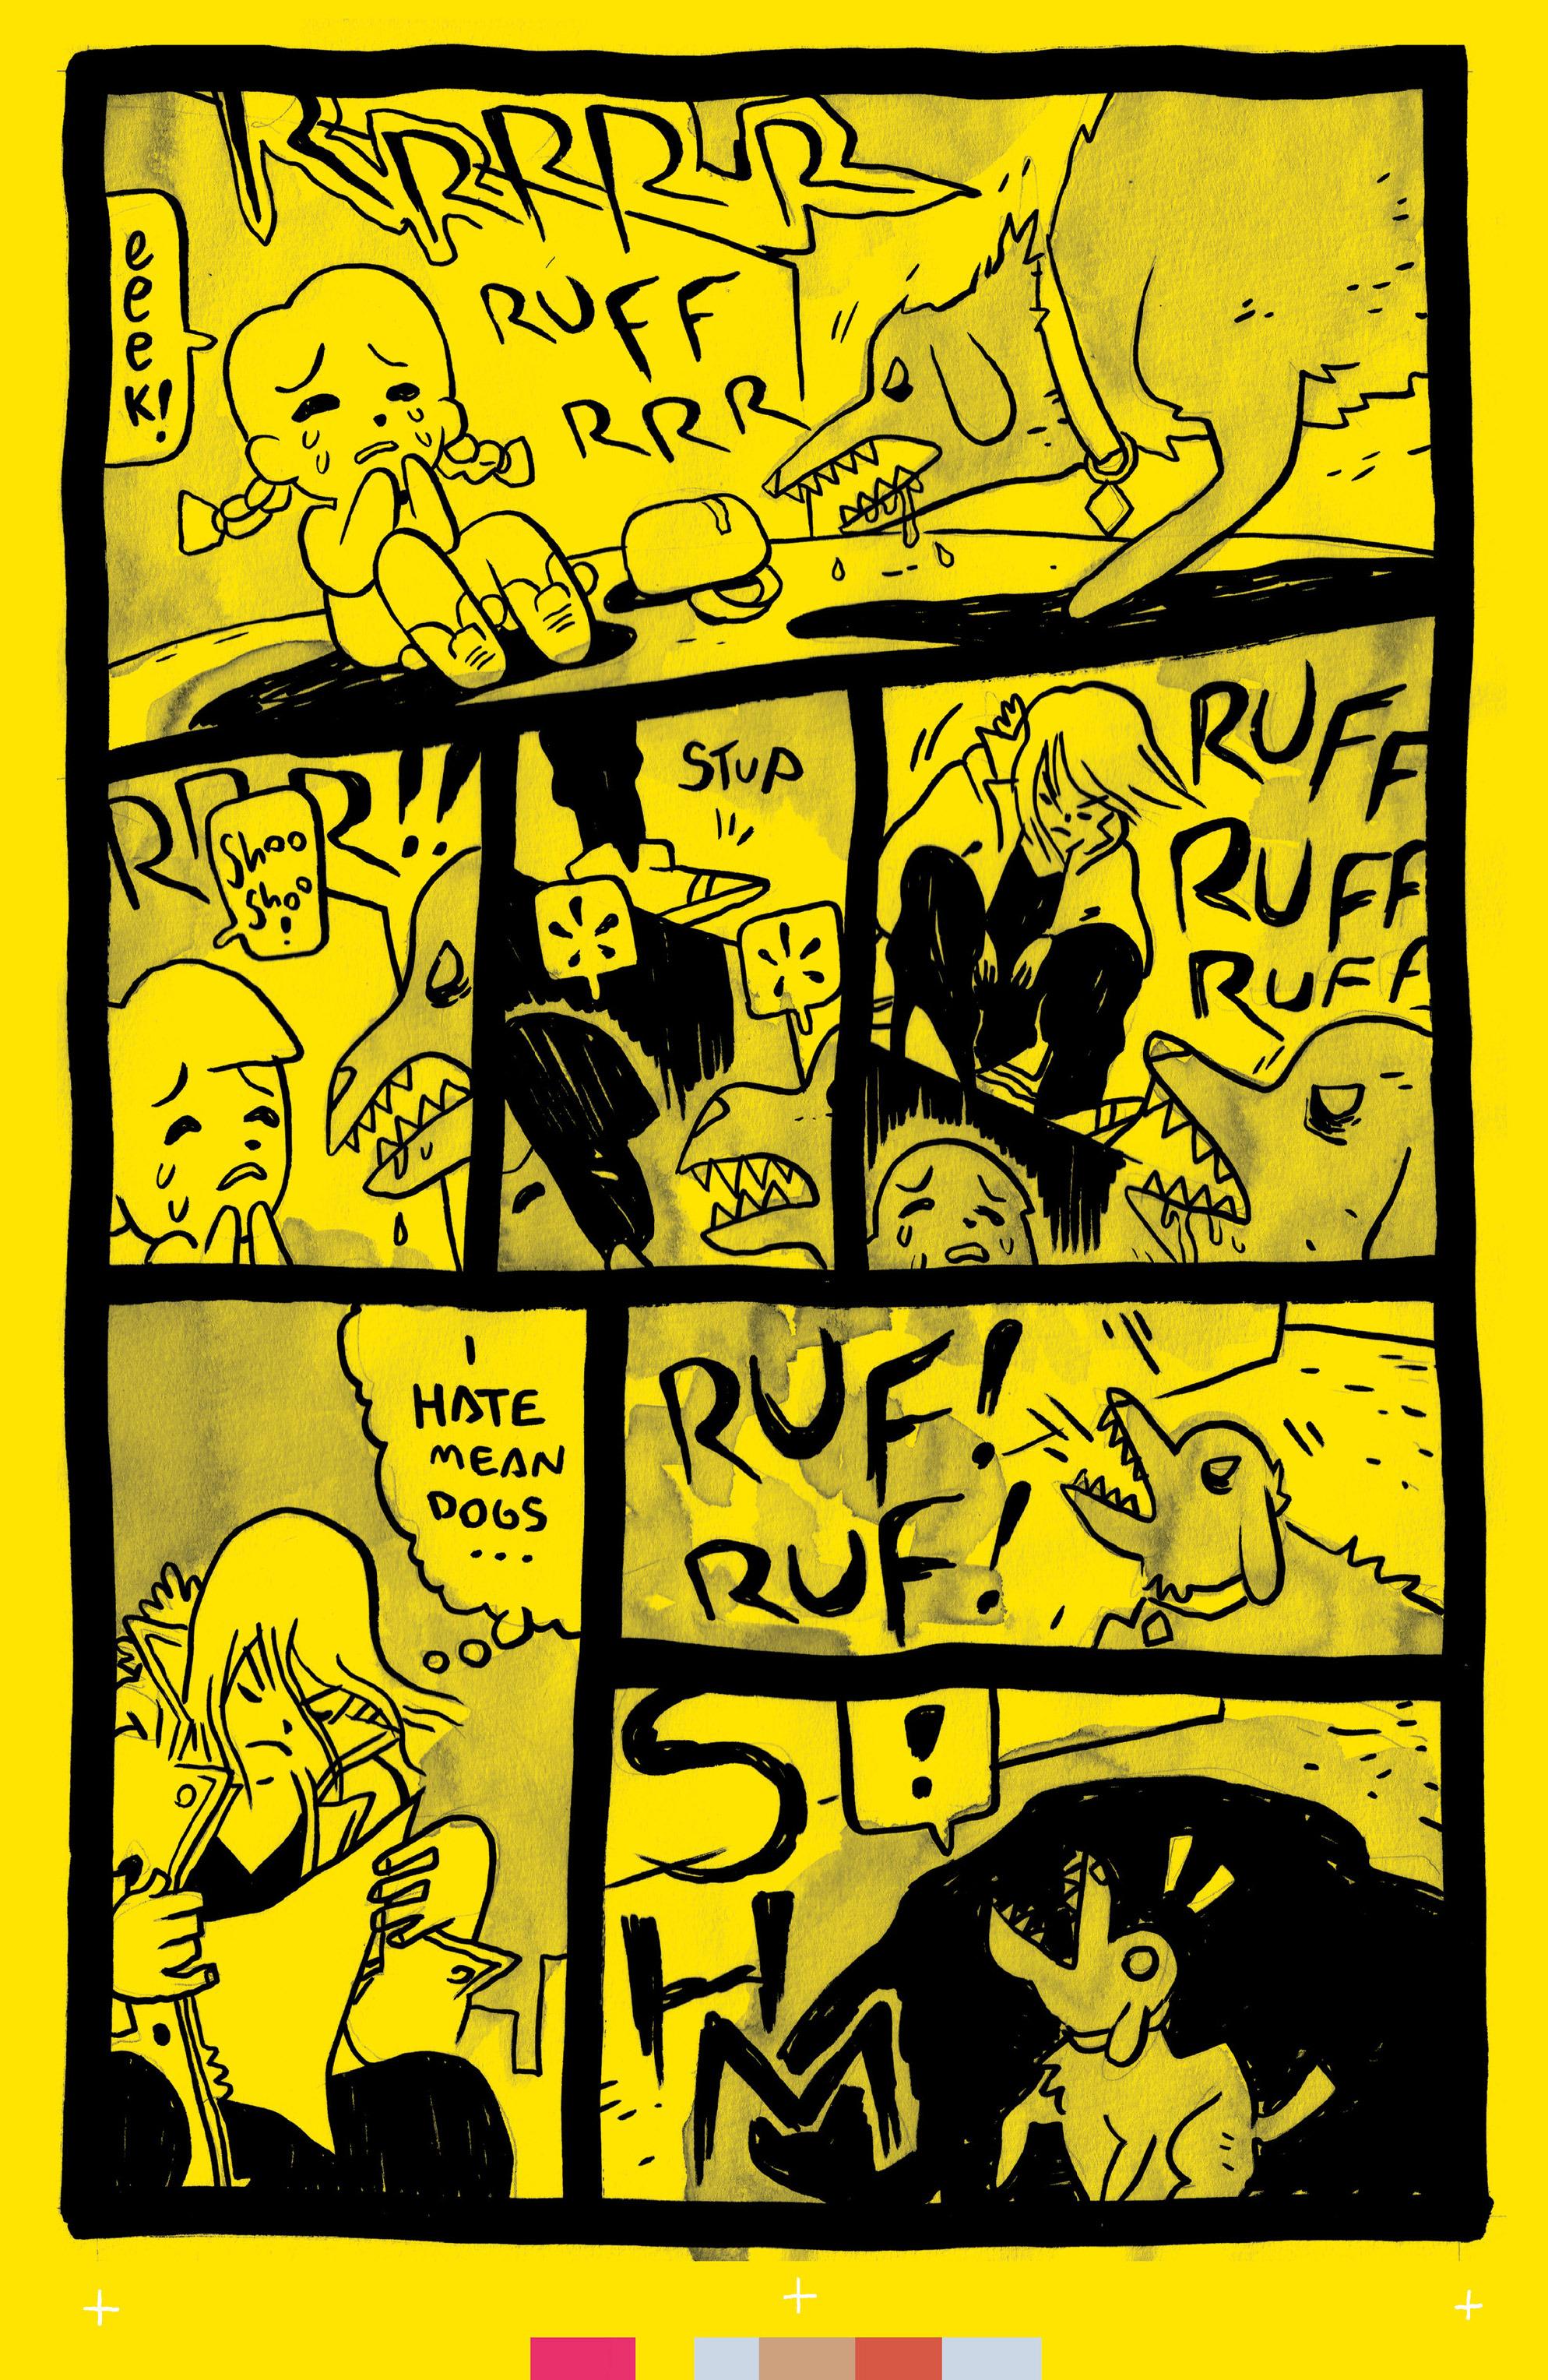 Read online Sun Bakery comic -  Issue #3 - 10